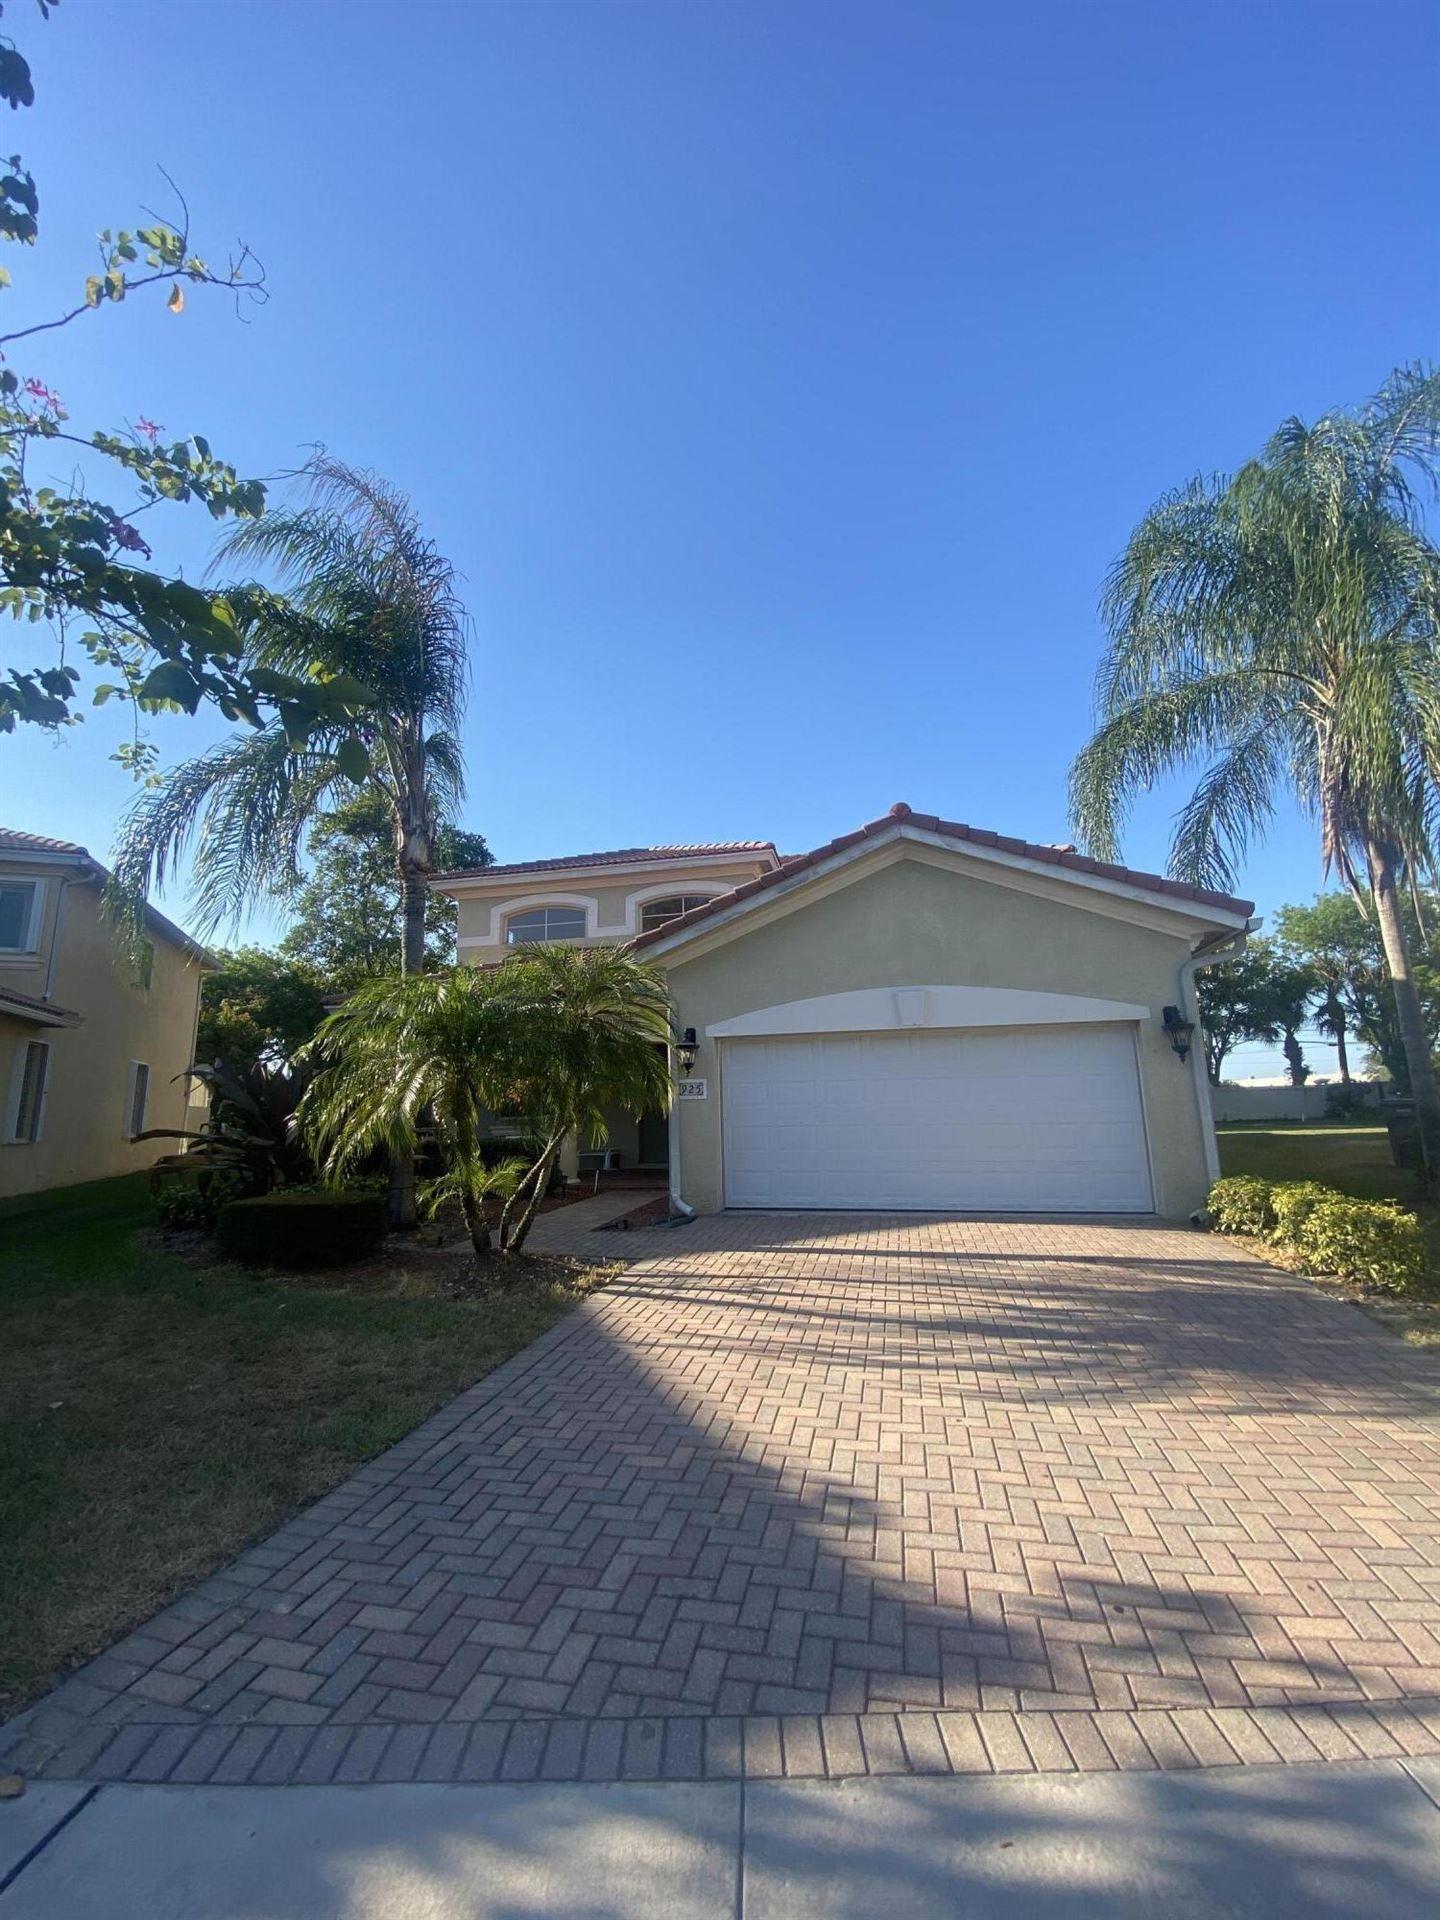 925 Gazetta Way, West Palm Beach, FL 33413 - #: RX-10720412